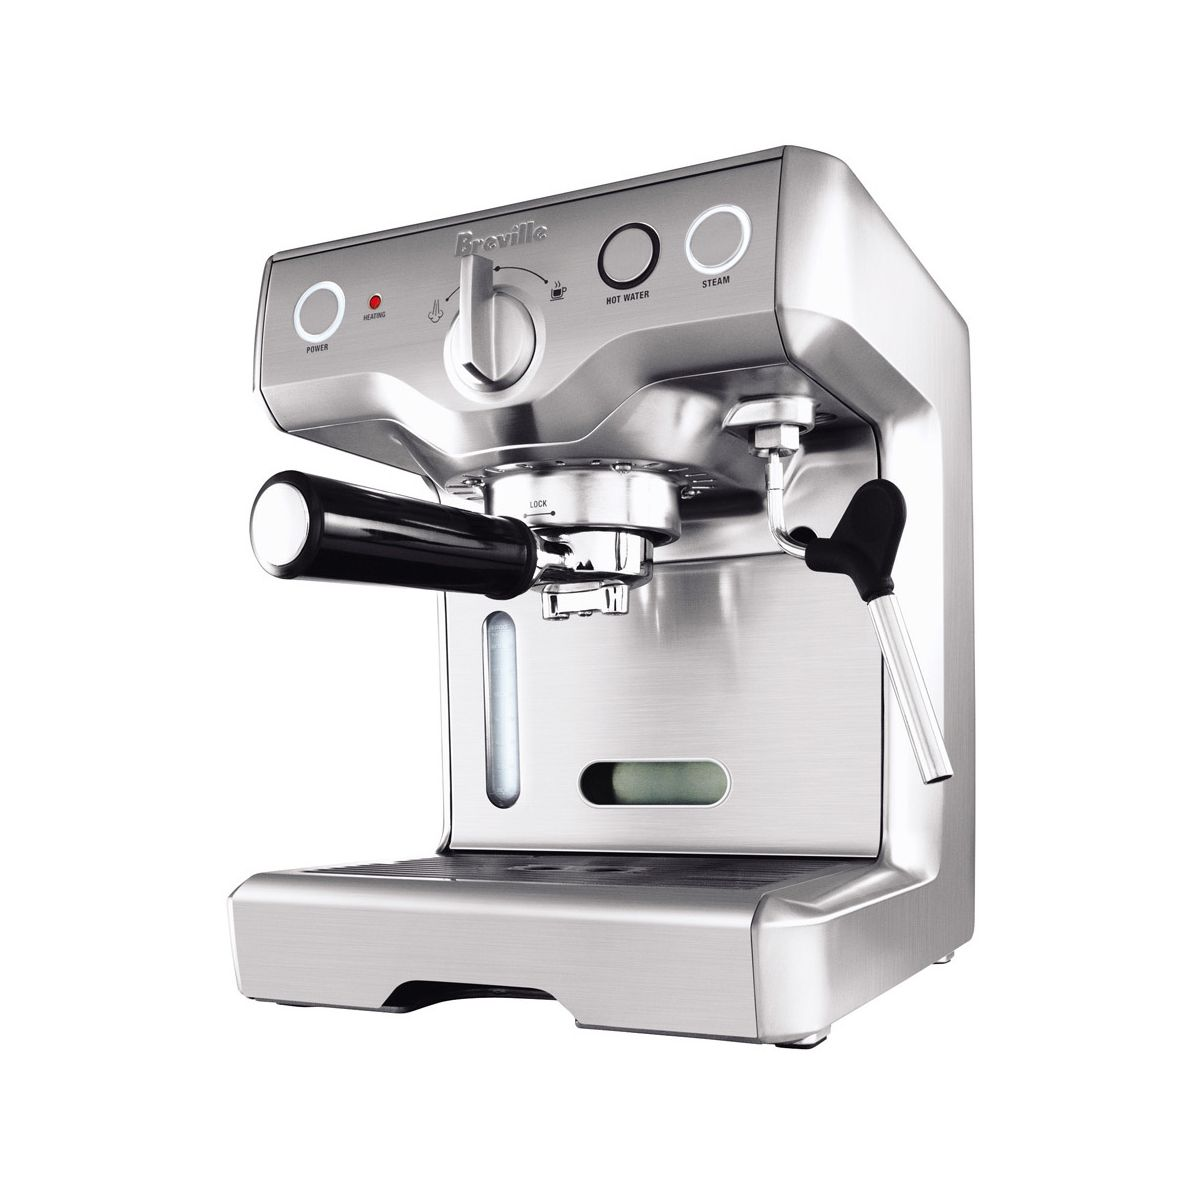 Personal Edge Breville 800esxl 15 Bar Triple Priming Cast Espresso Machine